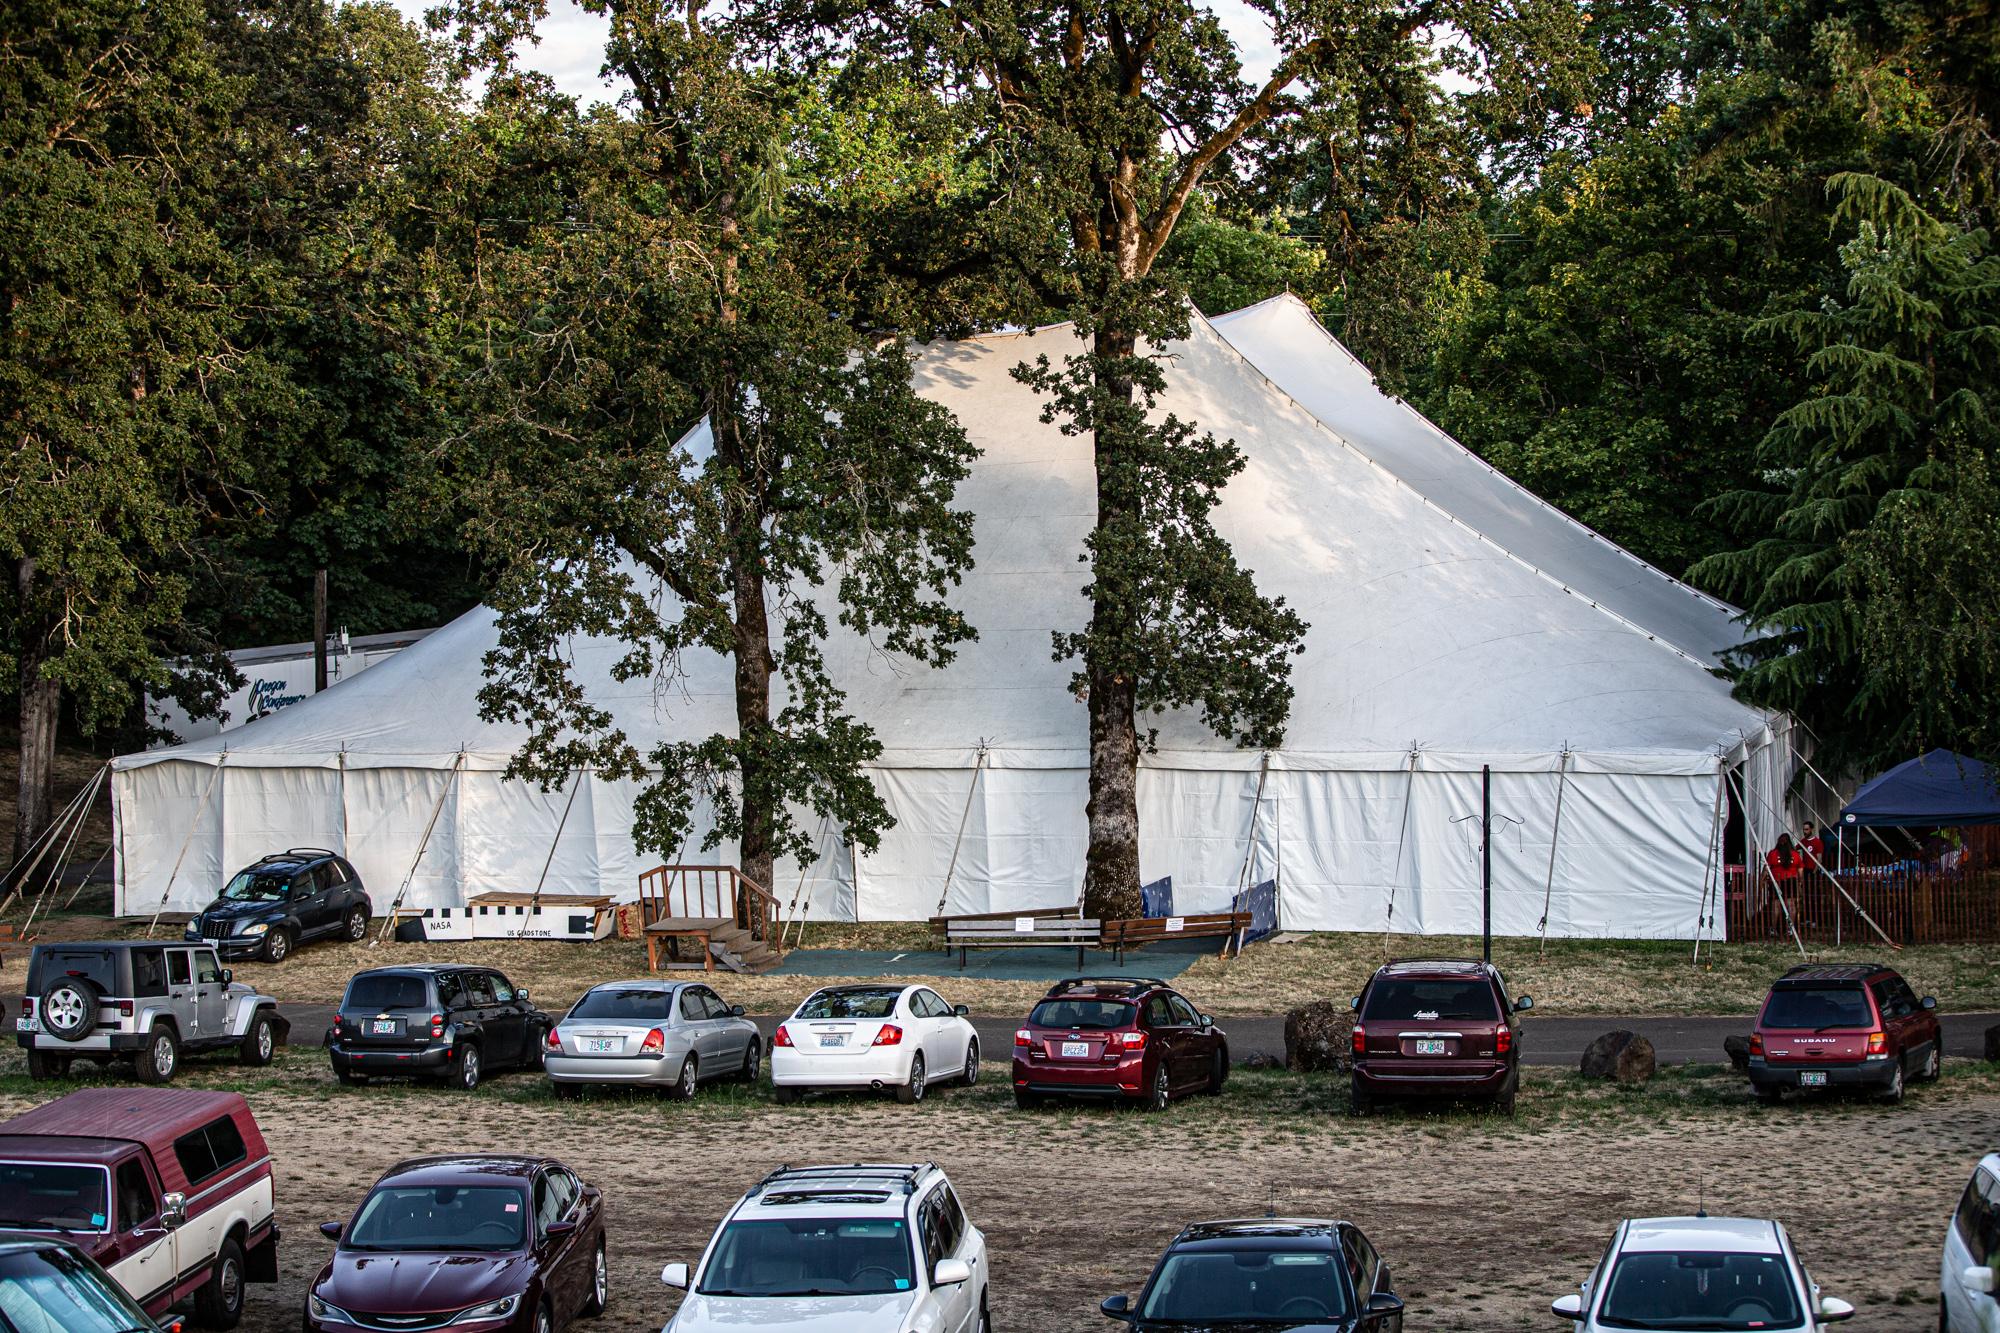 Beaver Tent